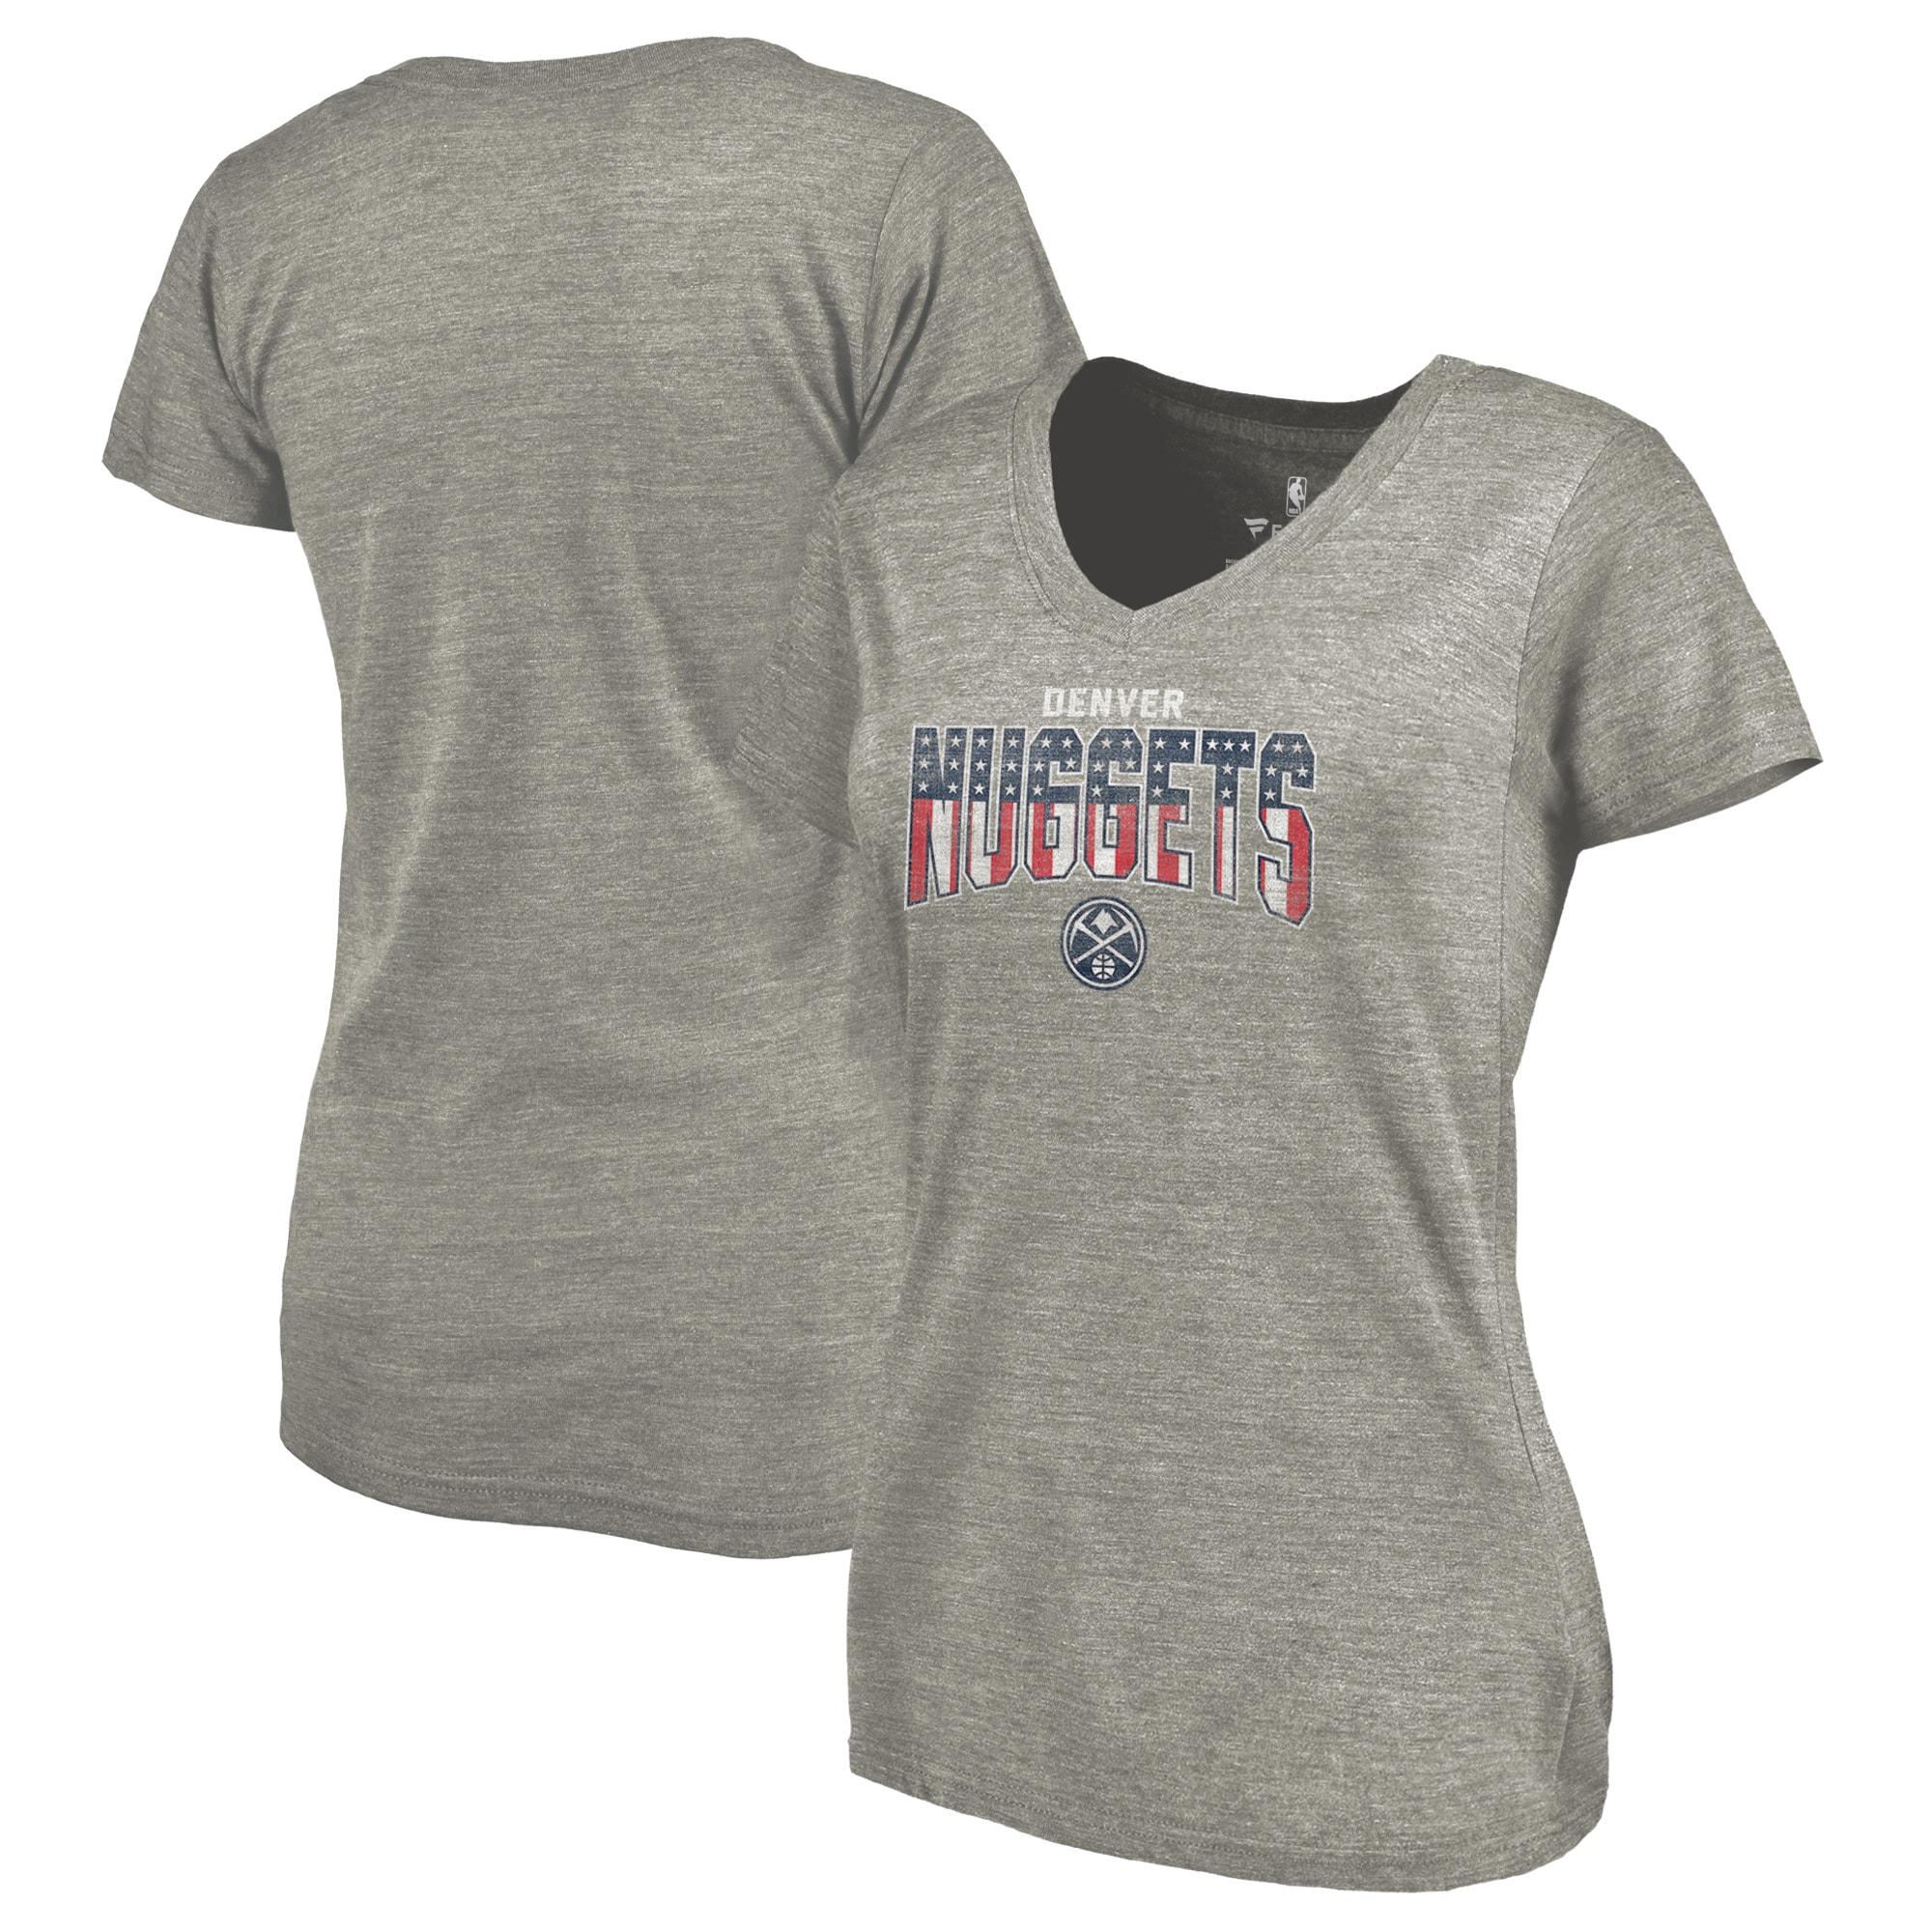 Denver Nuggets Fanatics Branded Women's Freedom Tri-Blend V-Neck T-Shirt - Heather Gray